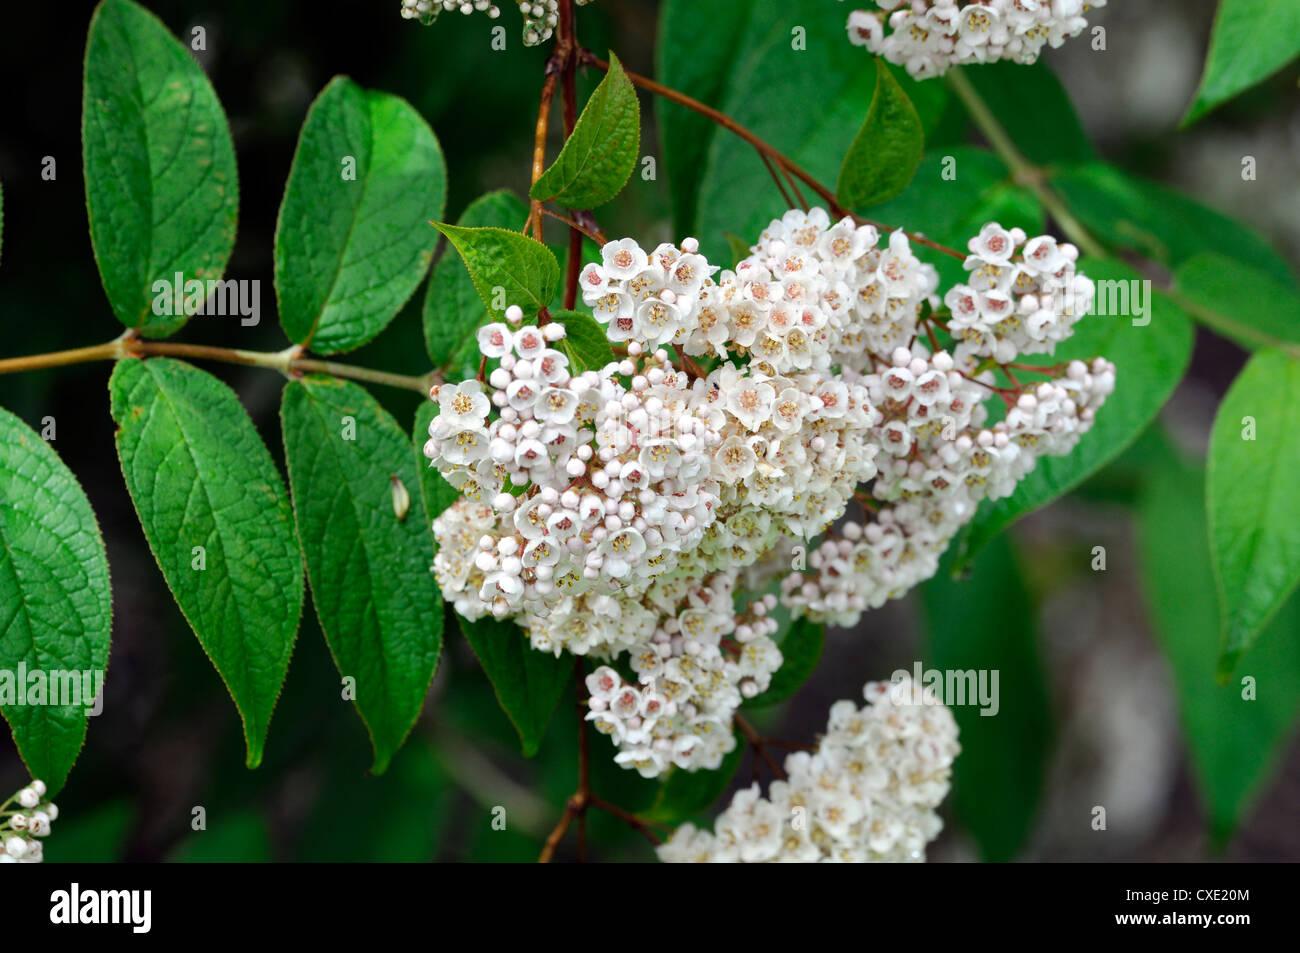 White Flowering Bushes Stock Photos White Flowering Bushes Stock